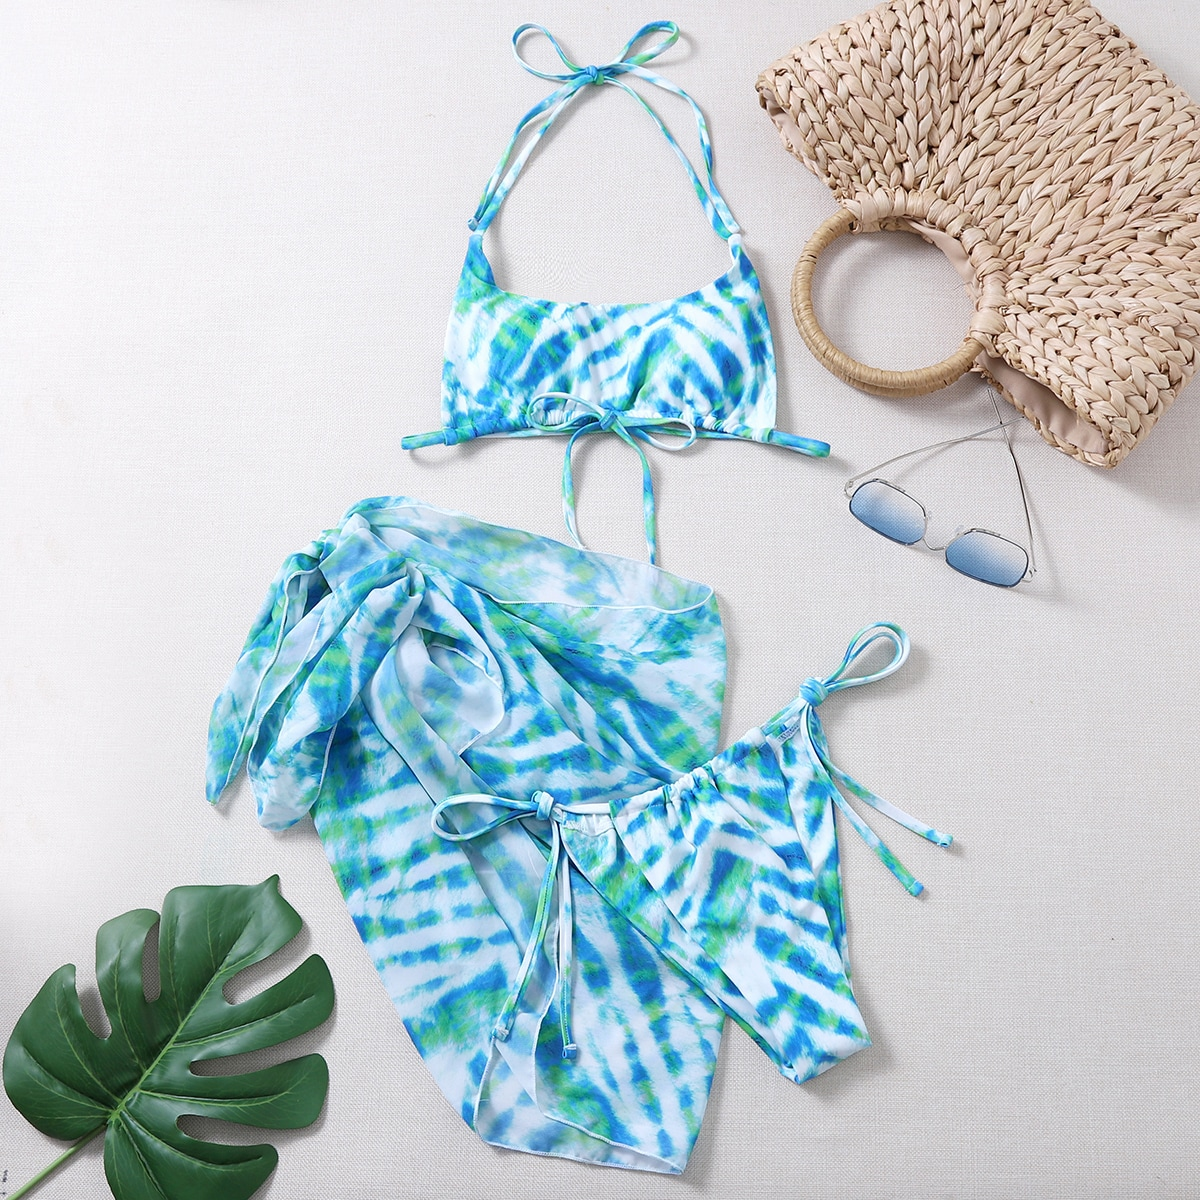 SHEIN / 3pack Tie Dye Halter Bikini Swimsuit & Beach Skirt